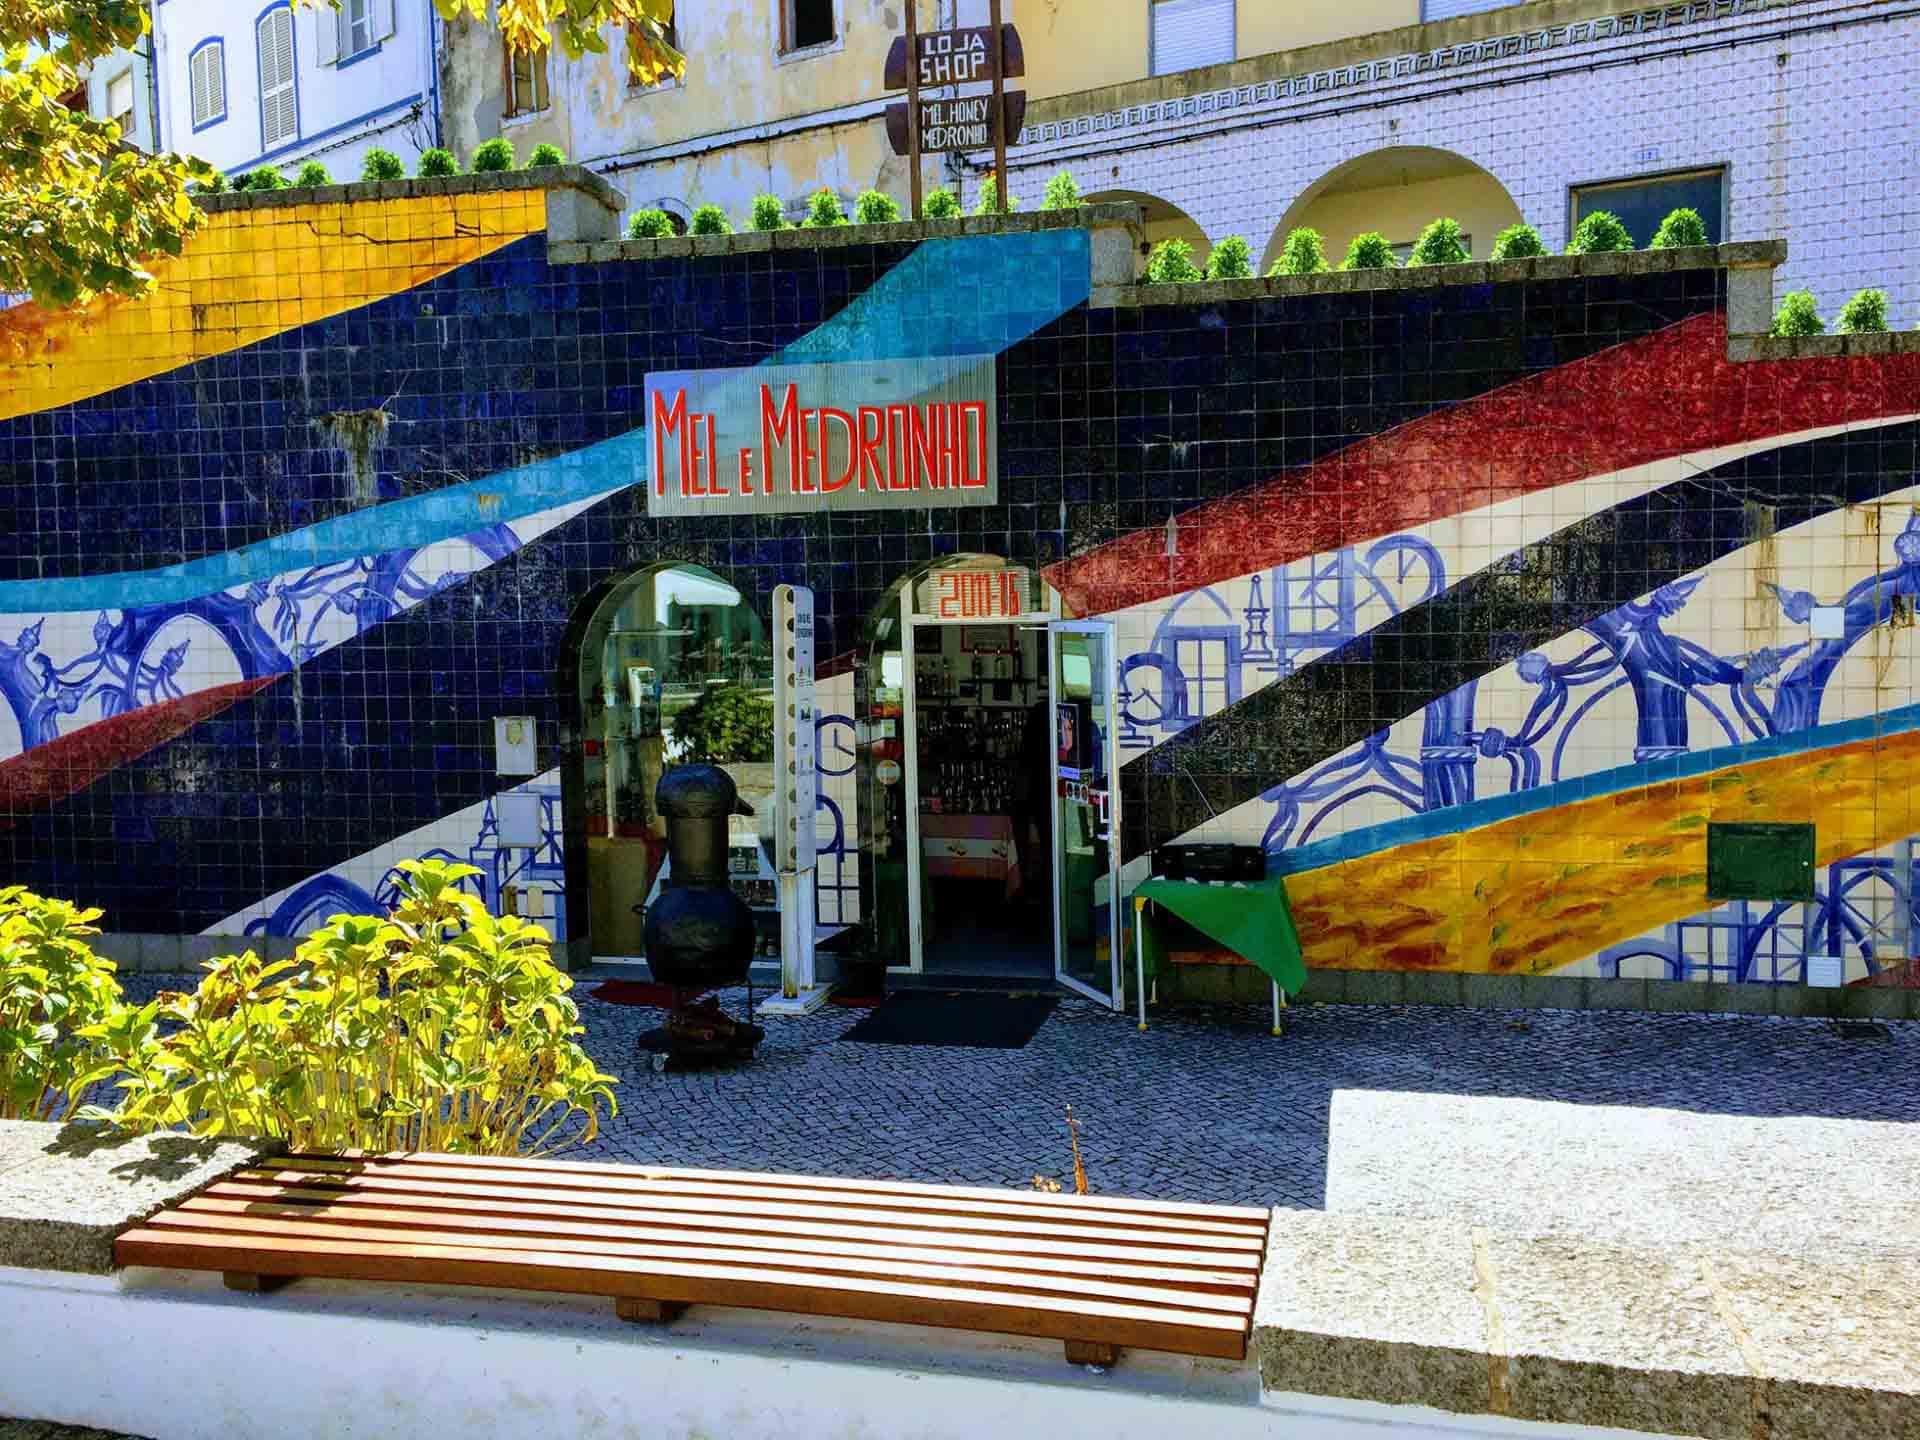 Medronha loja in Monchique